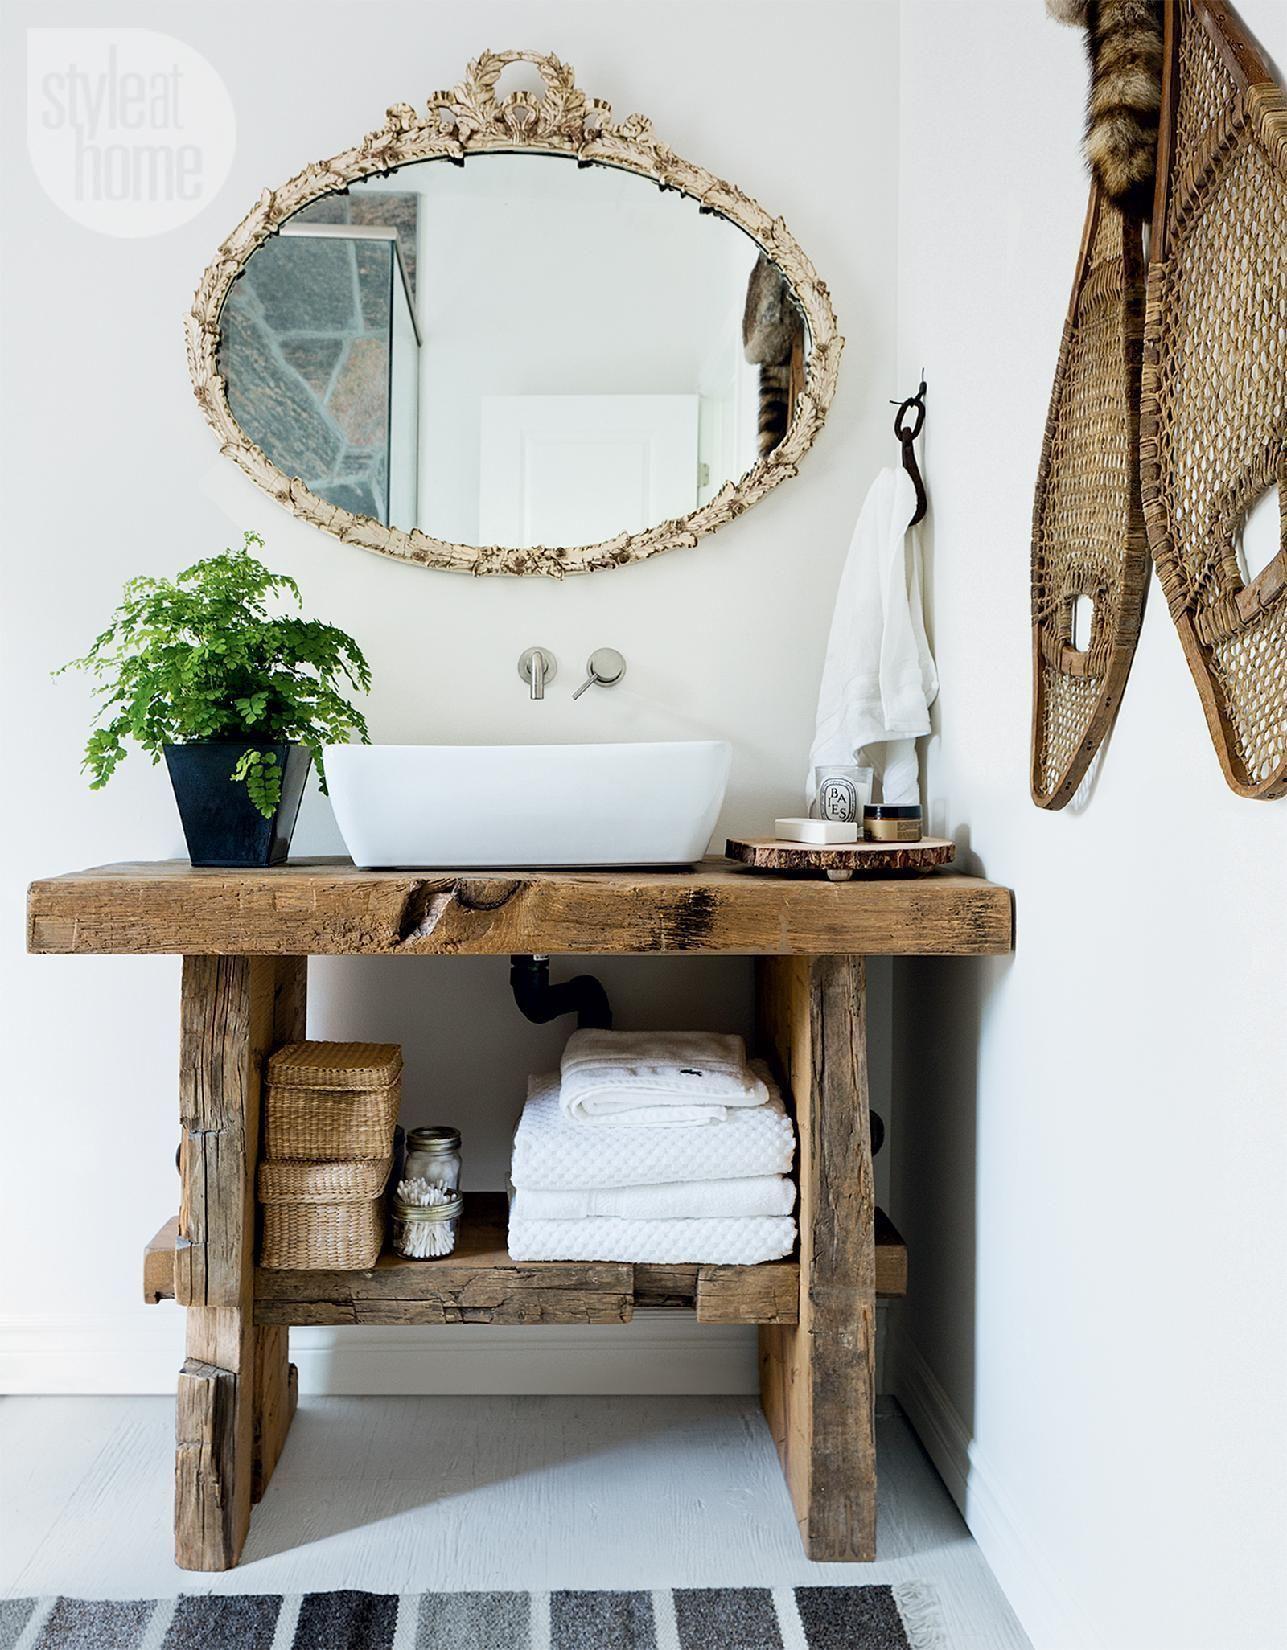 Photo of 10 rustikale Badezimmereitelkeiten zu herzhaften Dekorationsideen 201